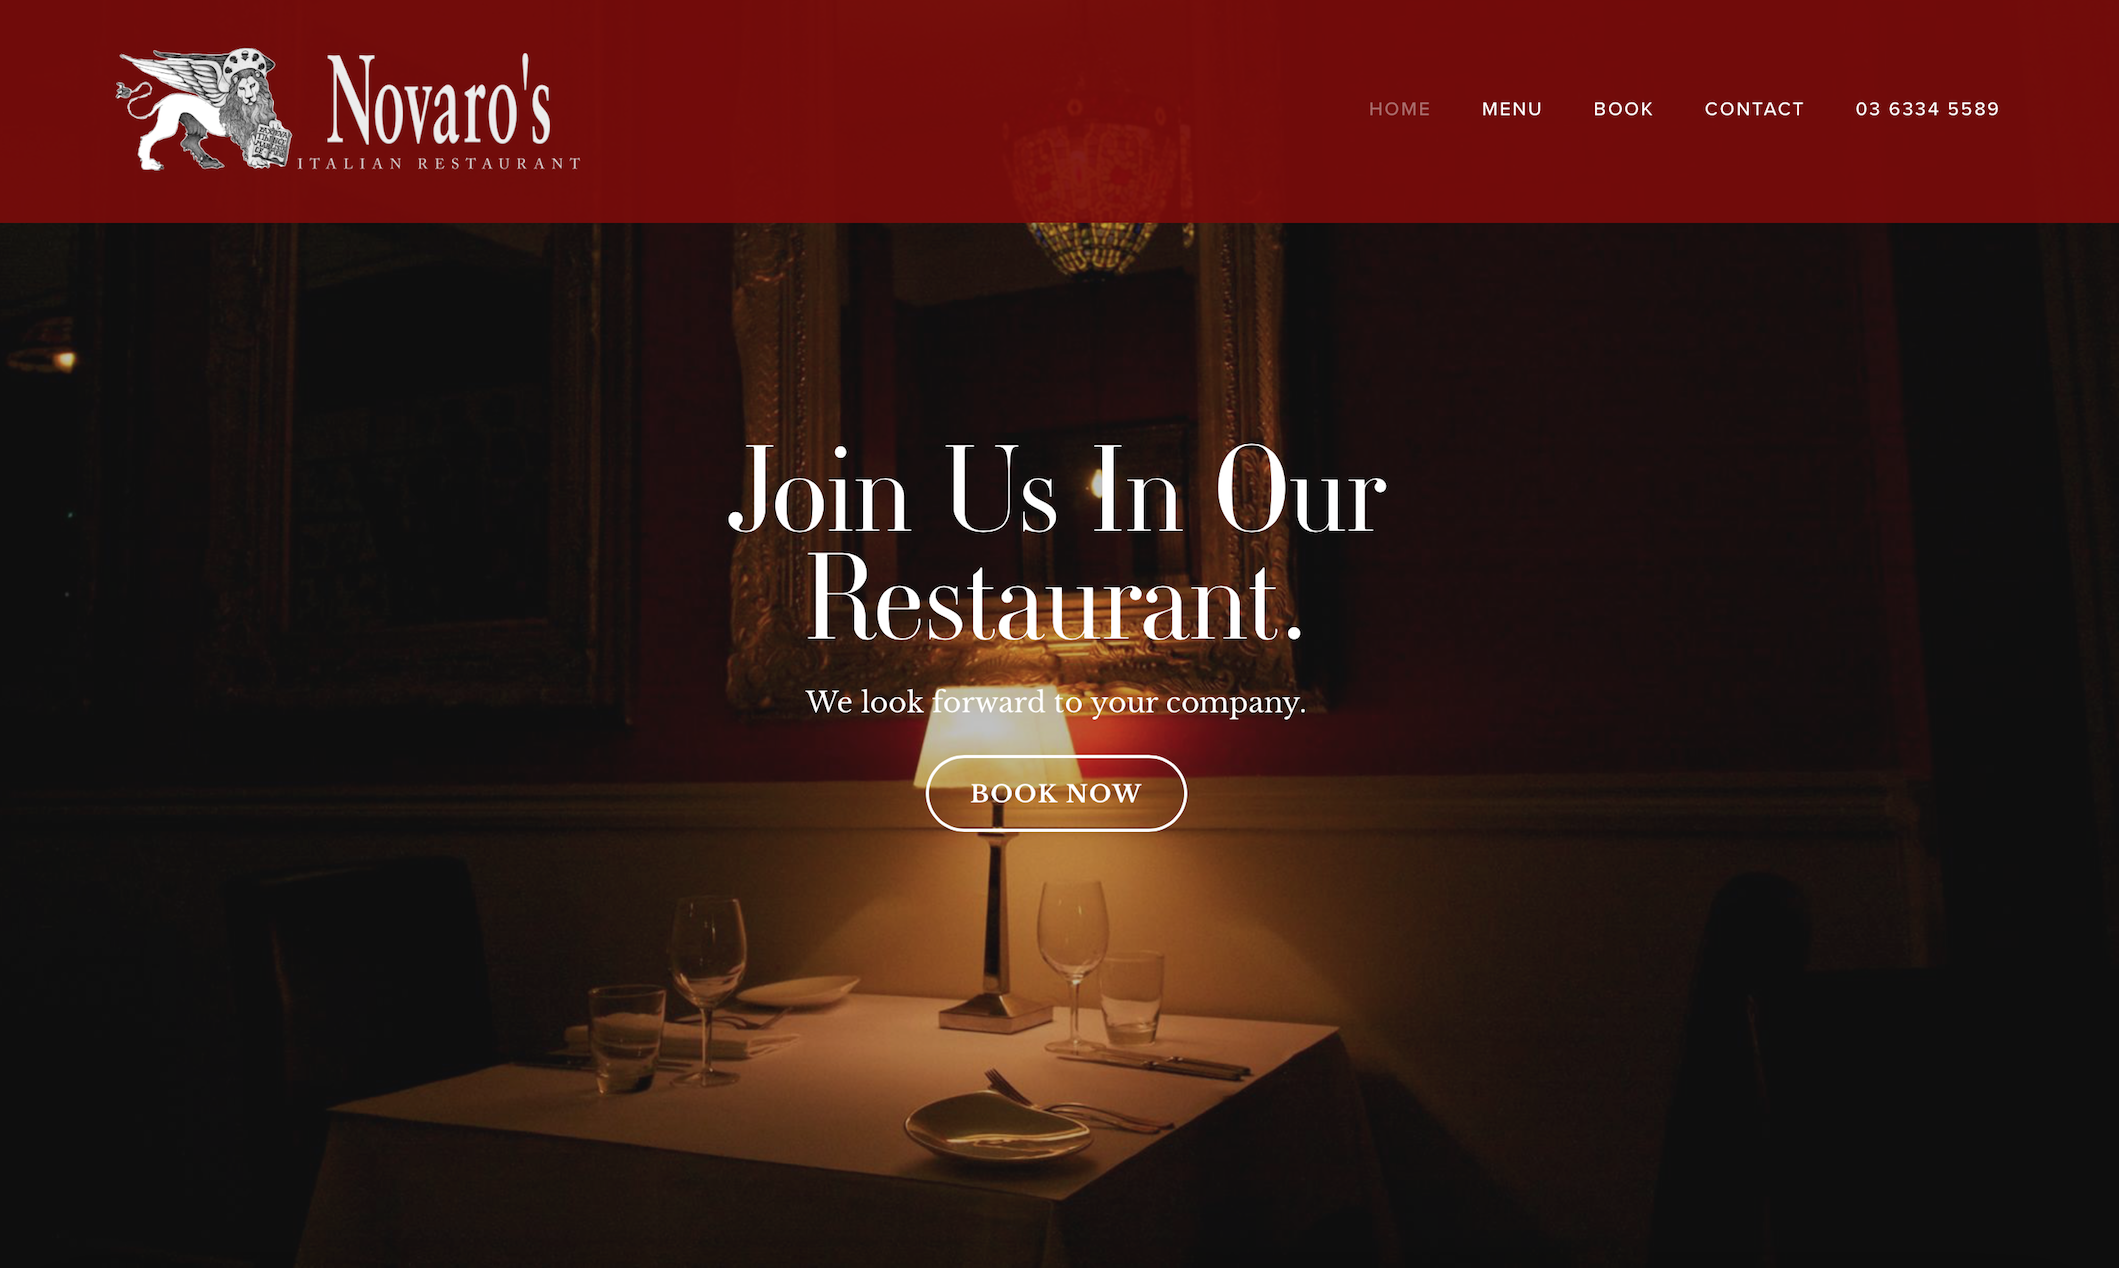 Novaro's Italian Restaurant